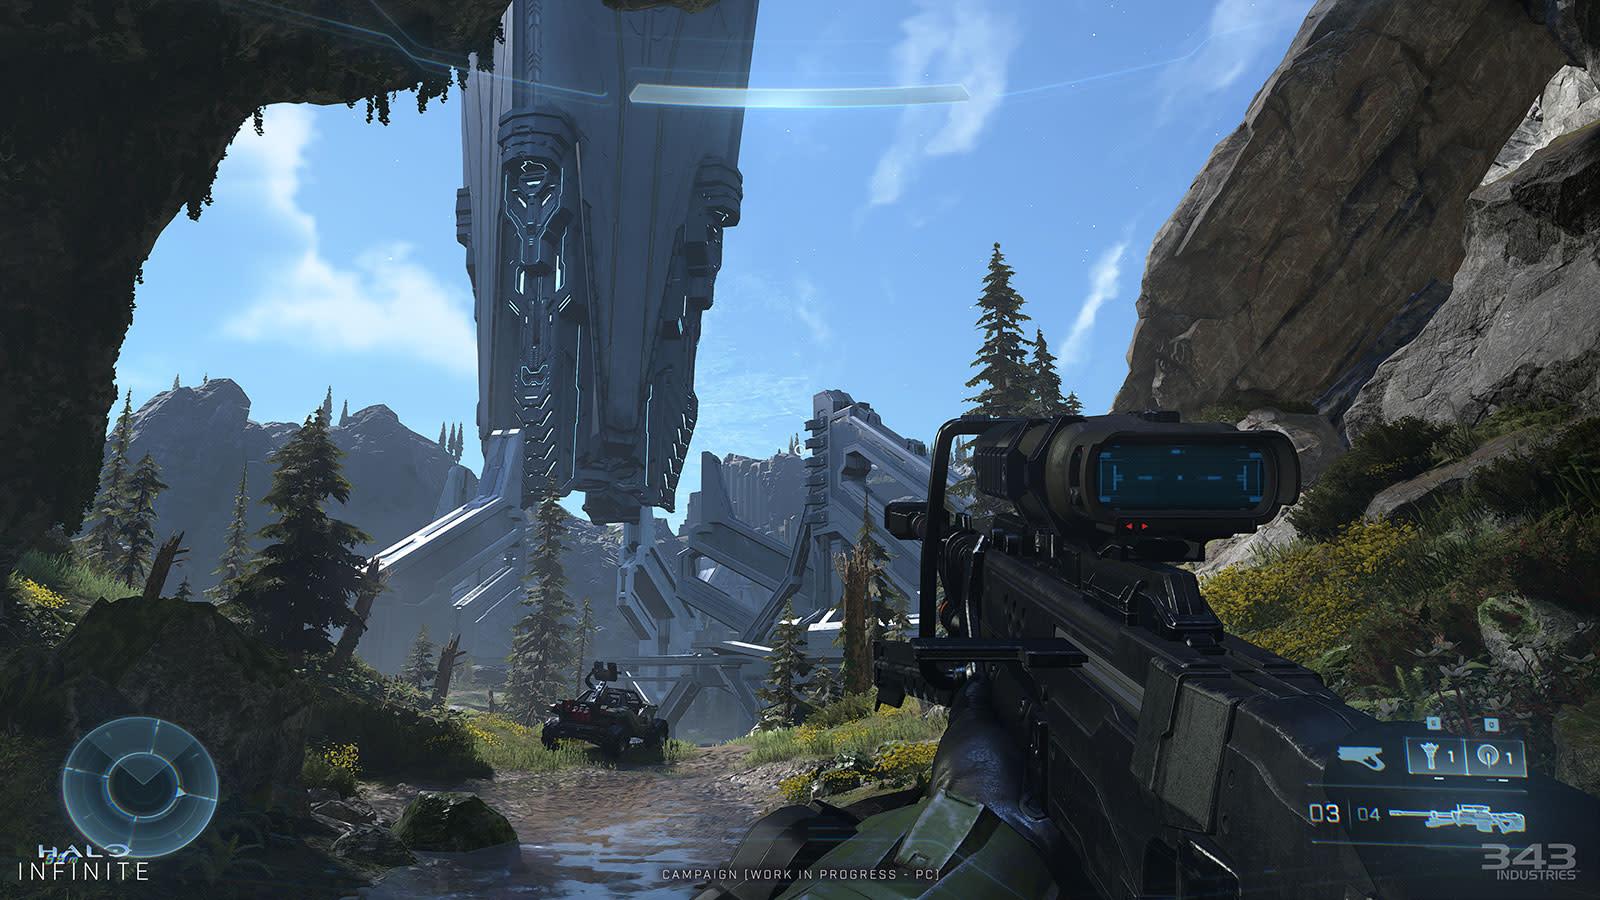 'Halo Infinite' screenshot of Zeta Halo